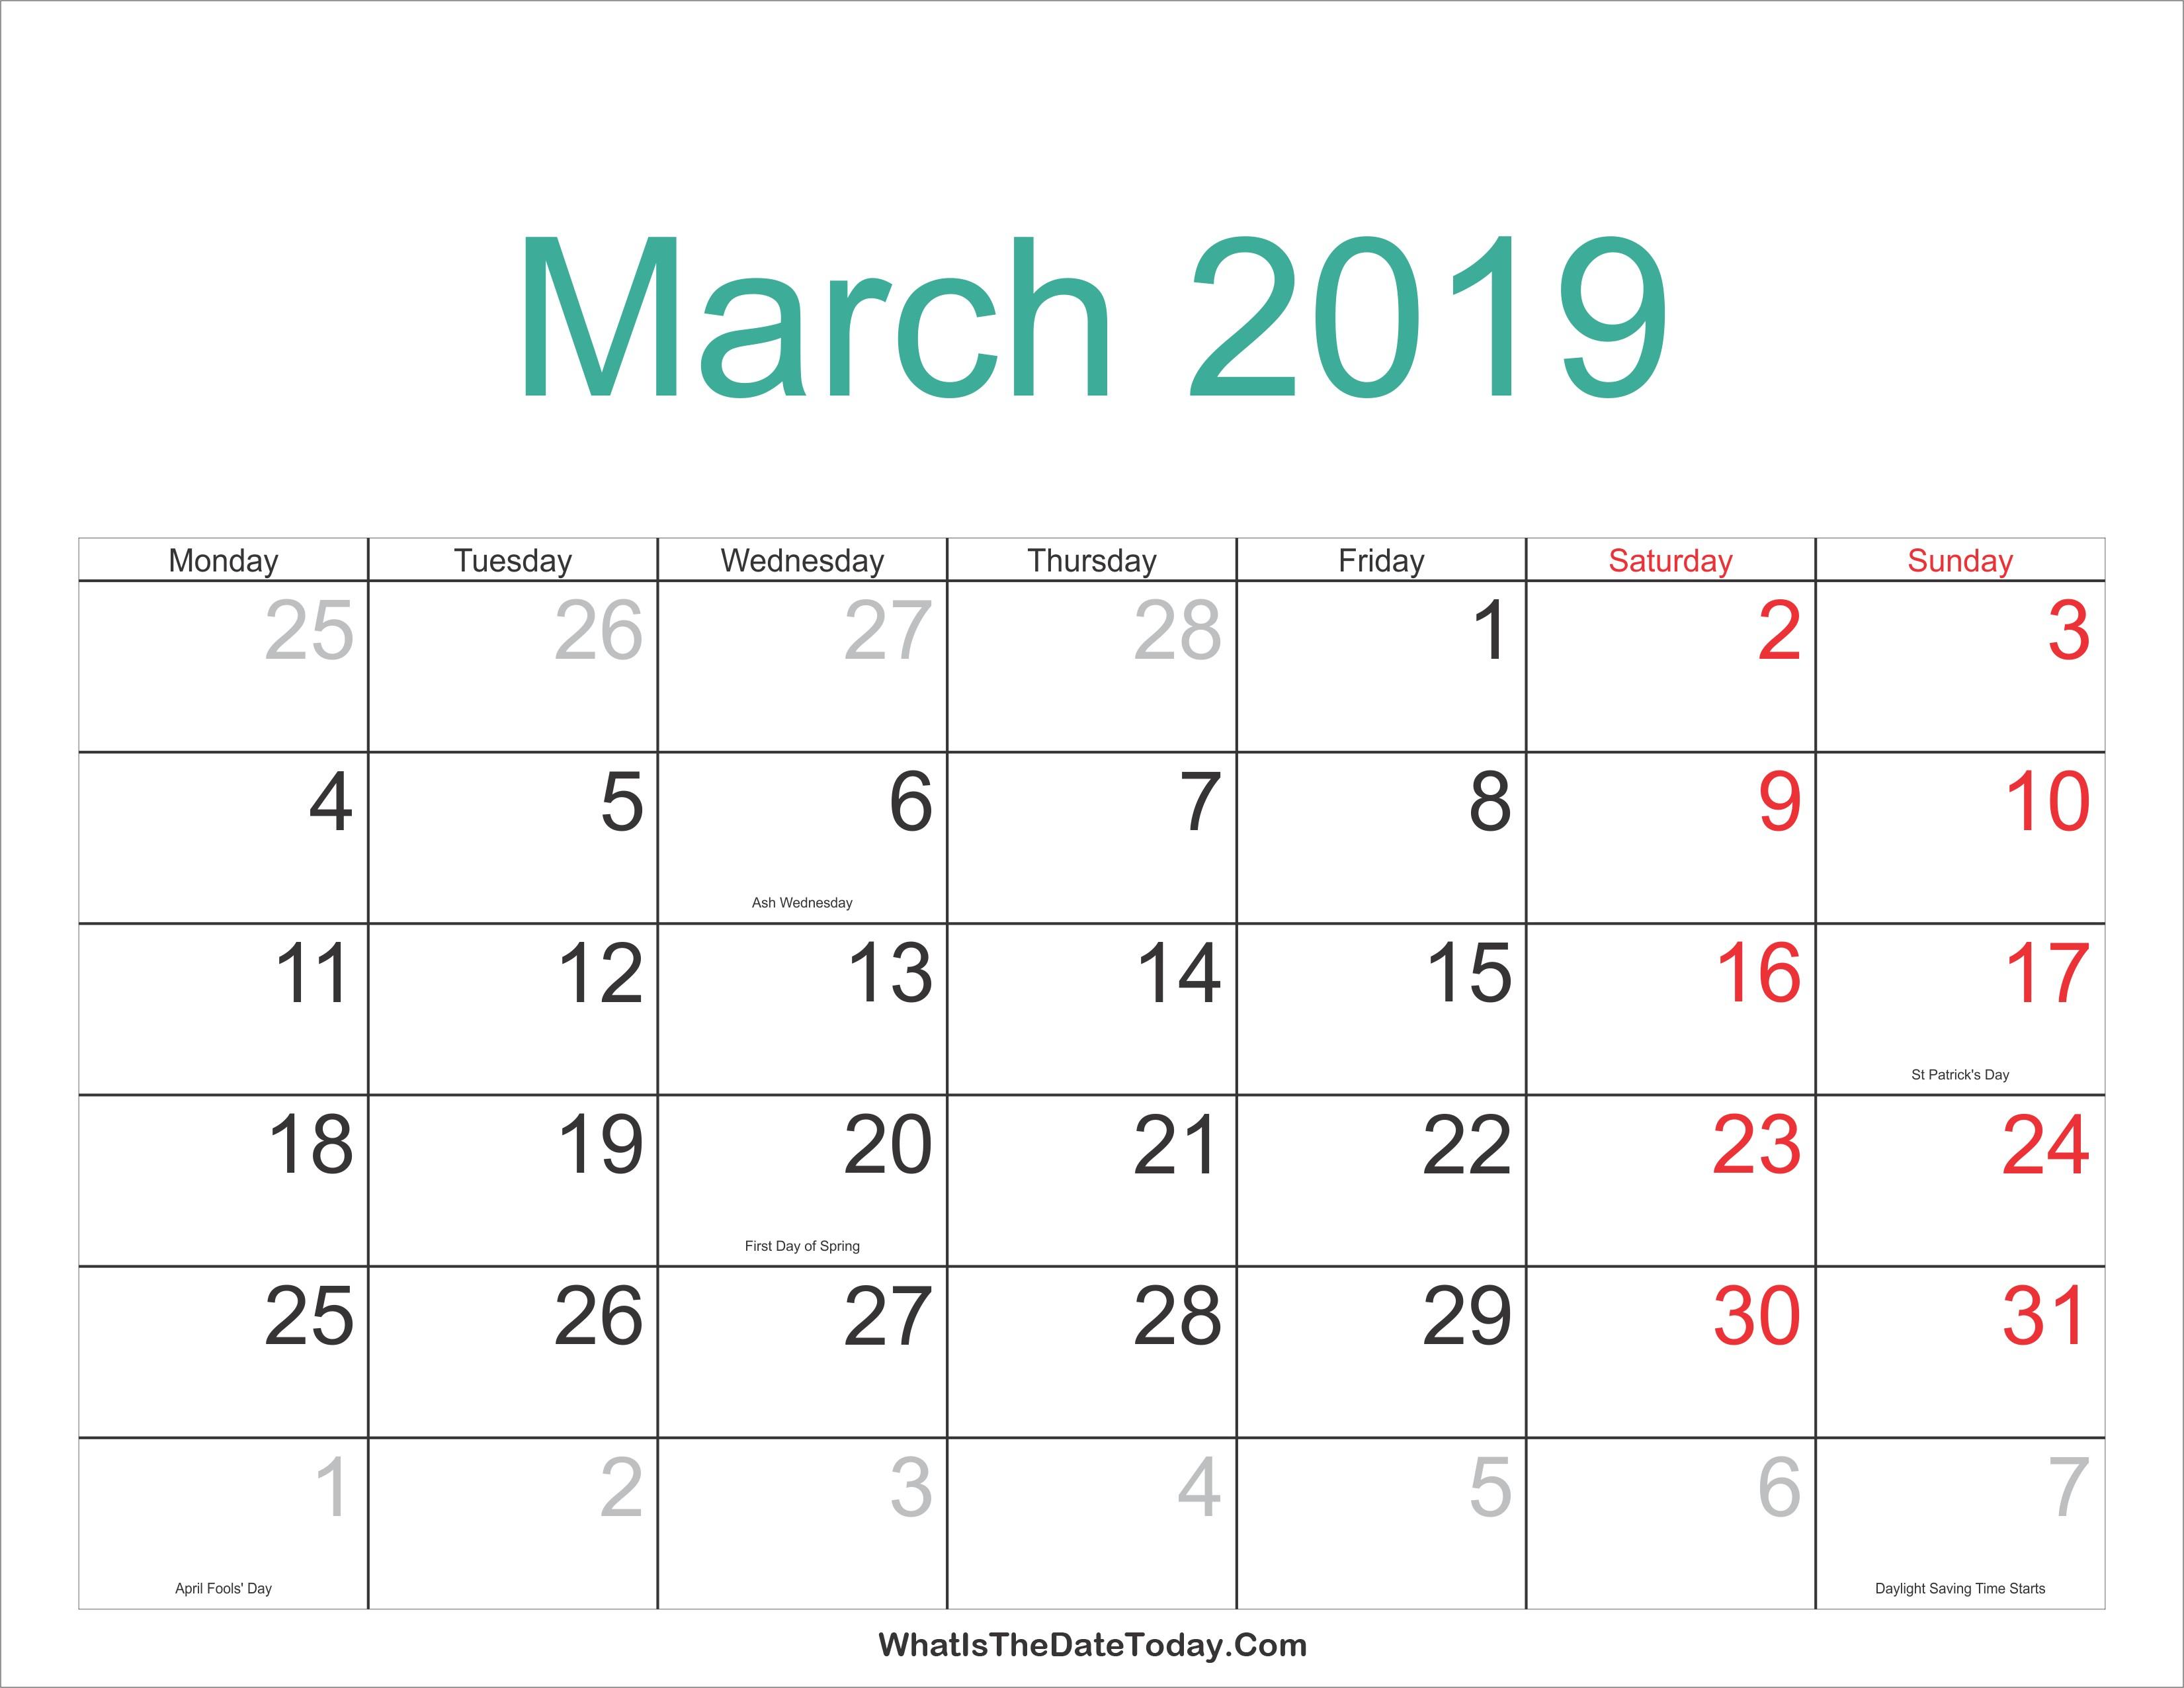 March Holiday Calendar 2019 Más Actual March 2019 Calendar Printable with Holidays Of March Holiday Calendar 2019 Más Caliente Printable March 2019 Calendar Template Holidays Yes Calendars